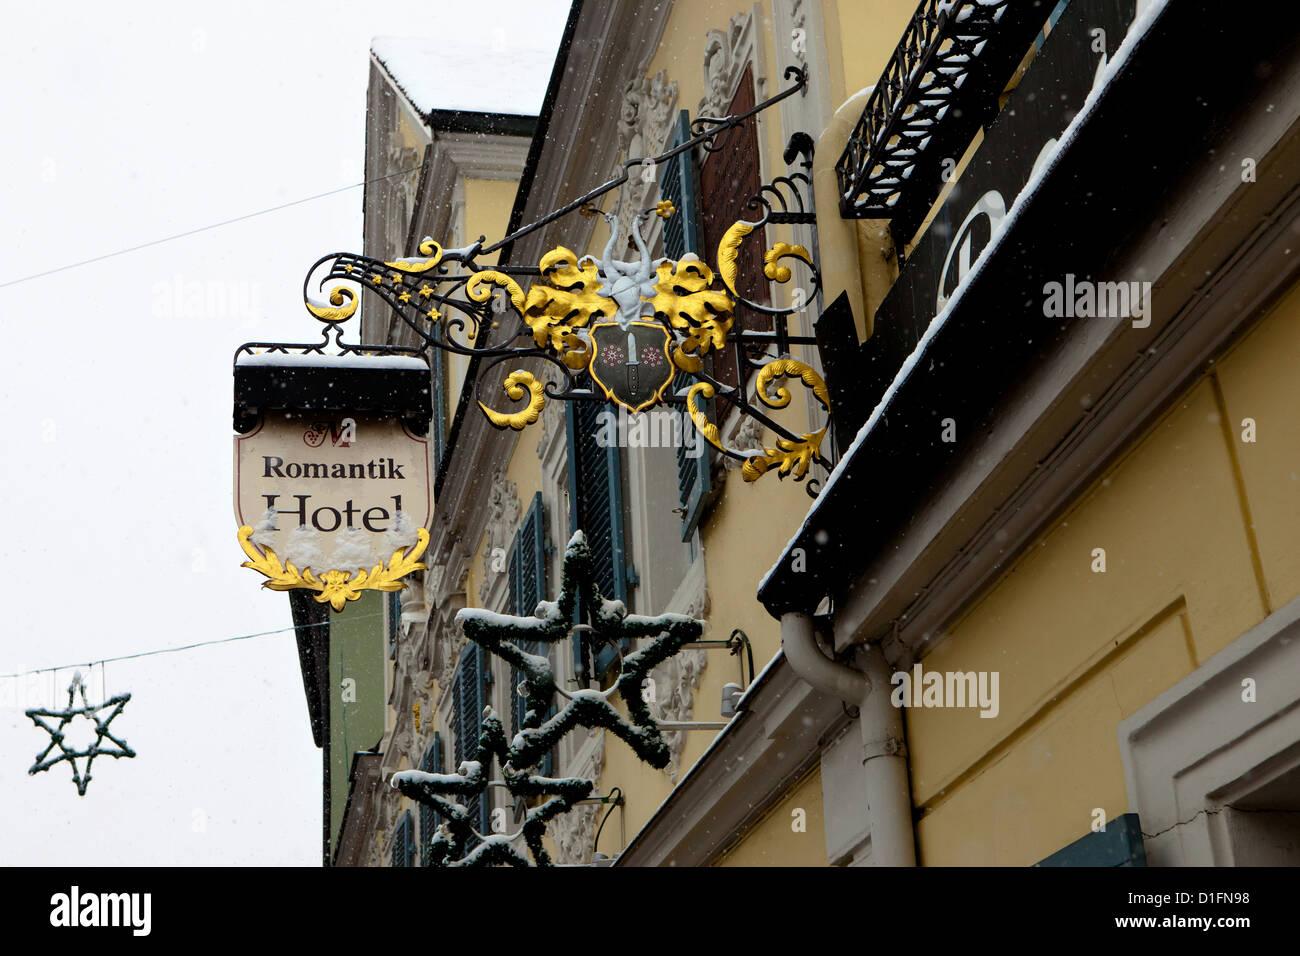 Romantik Hotel, Bamberg, Germany - Stock Image